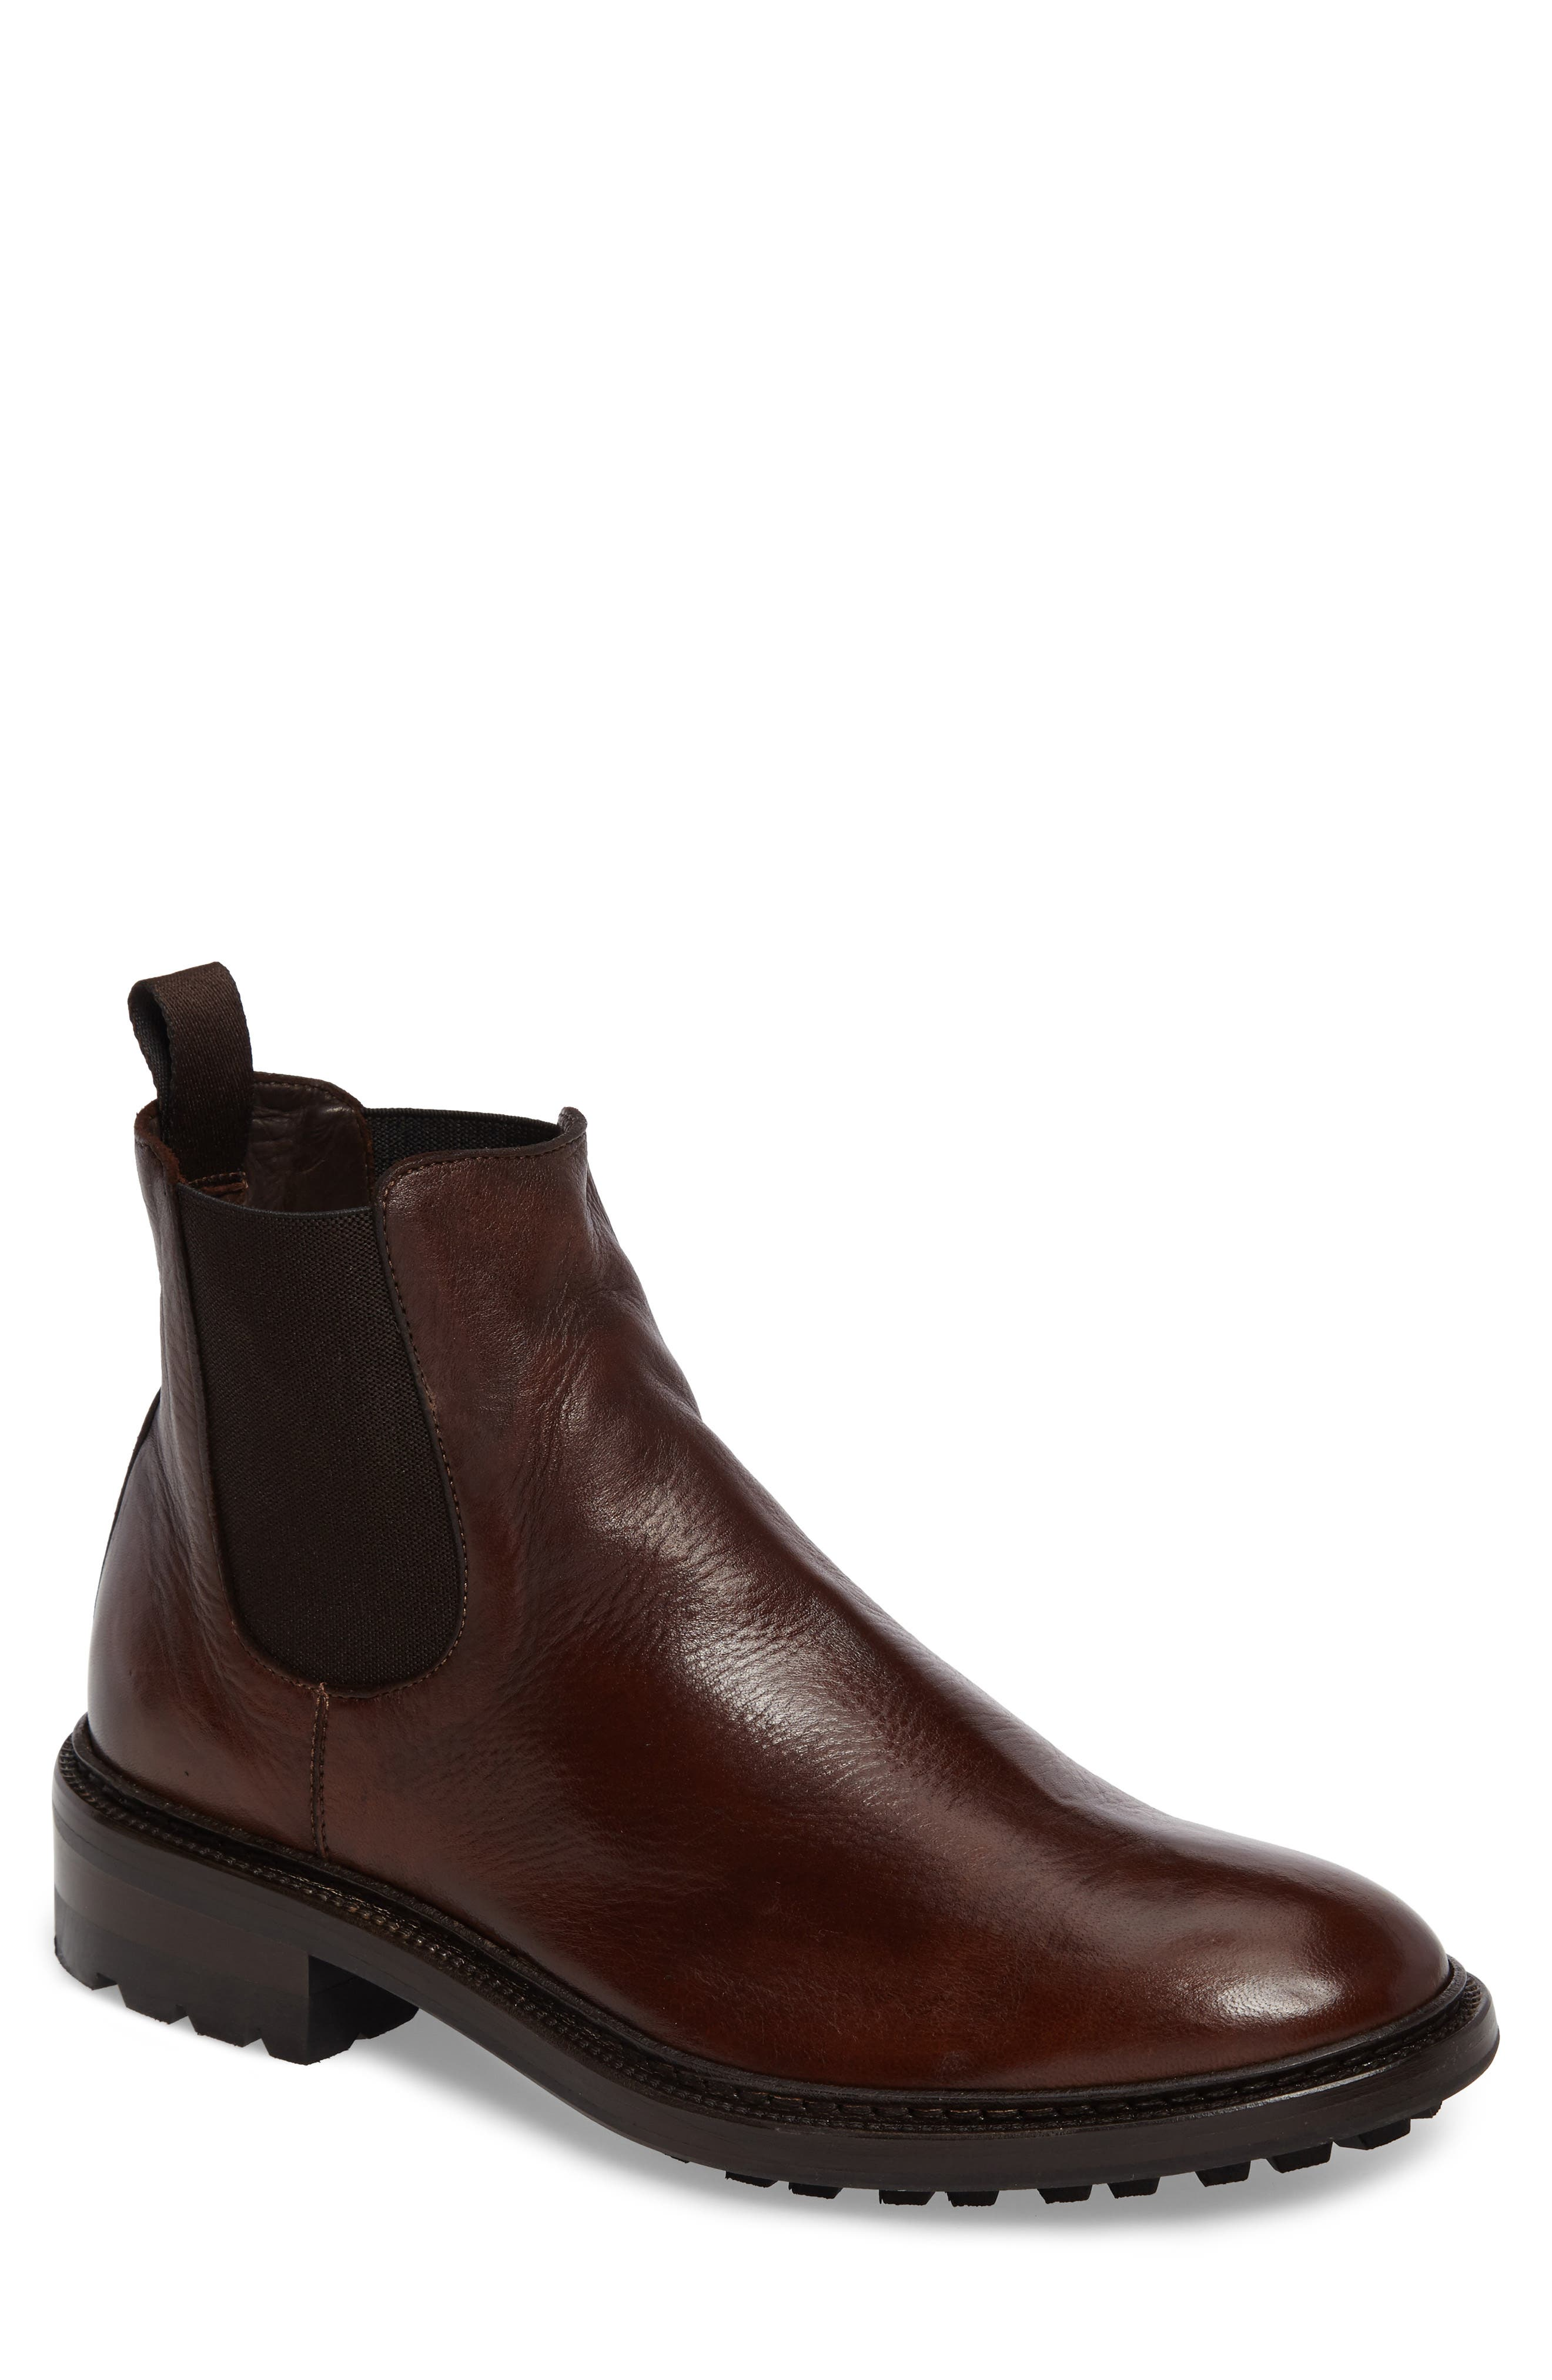 Greyson Chelsea Boot,                             Main thumbnail 1, color,                             COGNAC